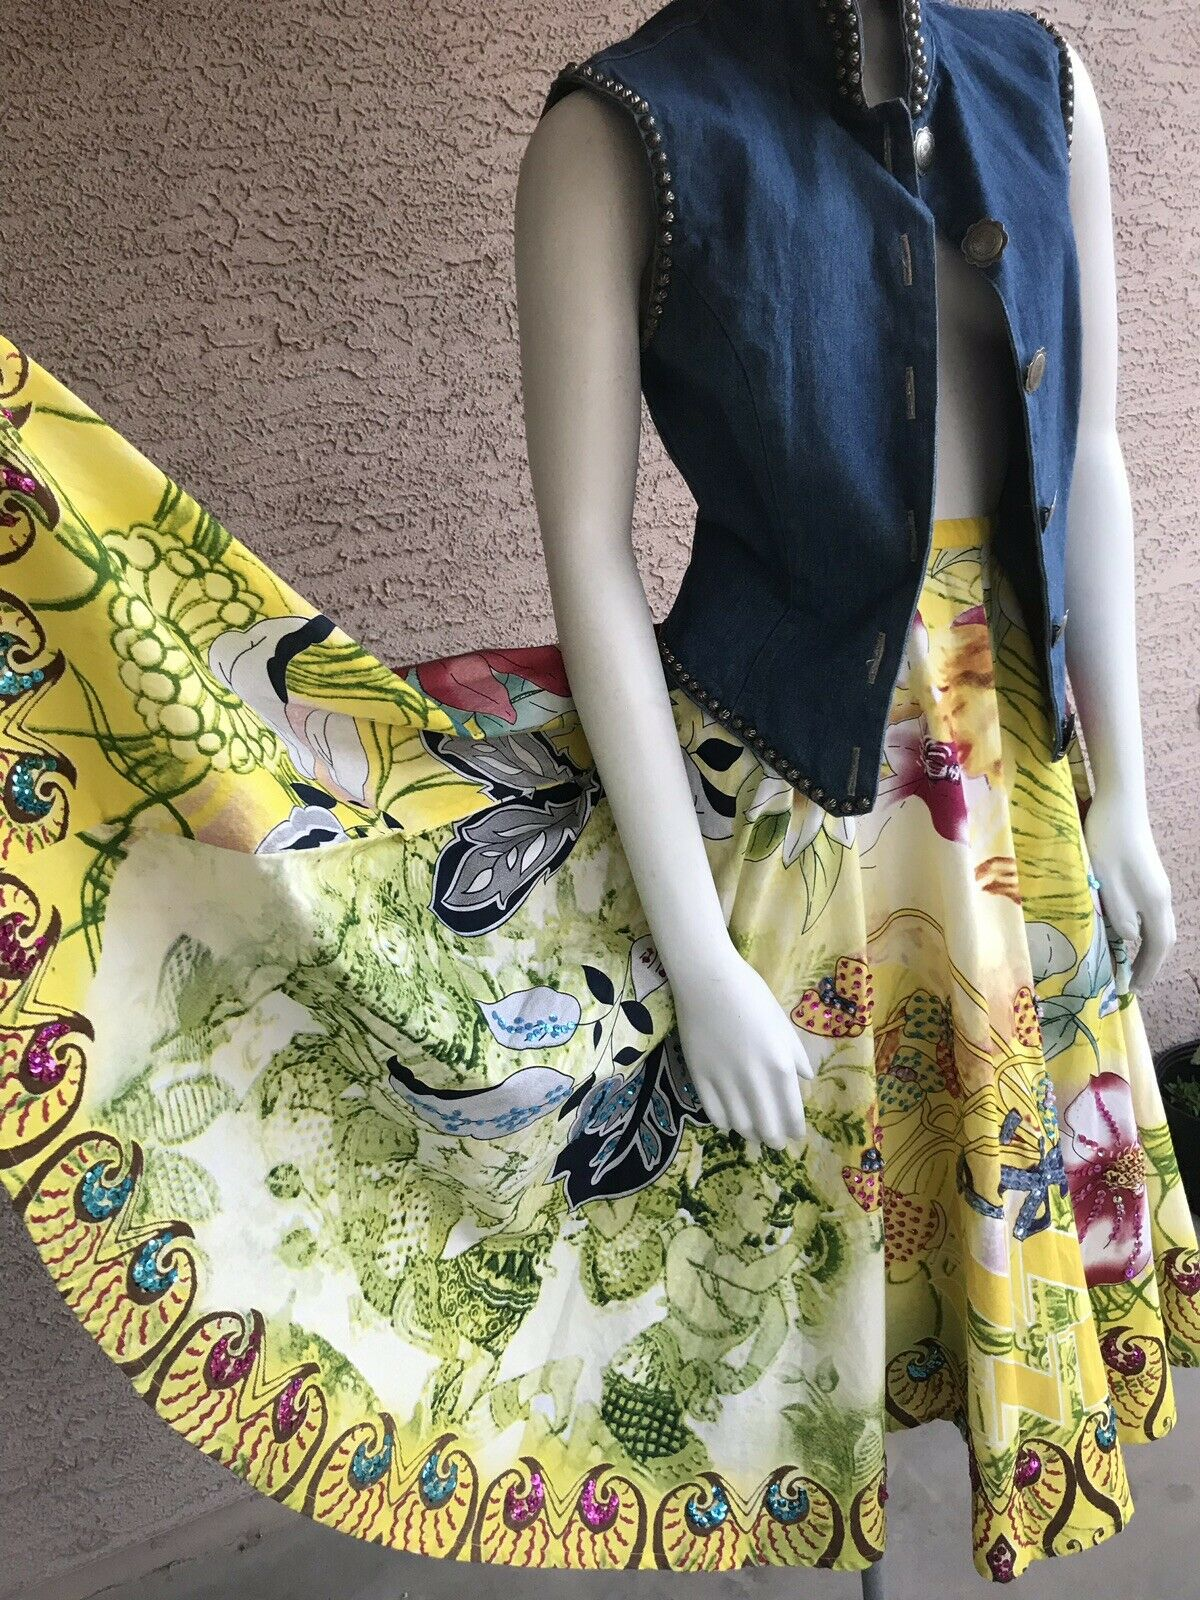 Vtg 50s 60s Stil Circle Rock Floral Swing Square Dance 3d Sequin beads ARTSY